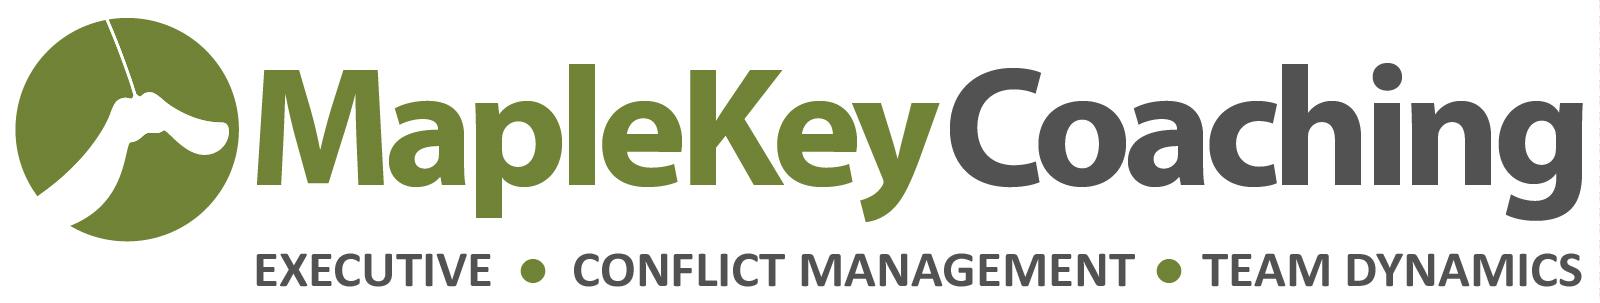 MapleKey Coaching | Bette Watson-Borg | Halifax, Nova Scotia